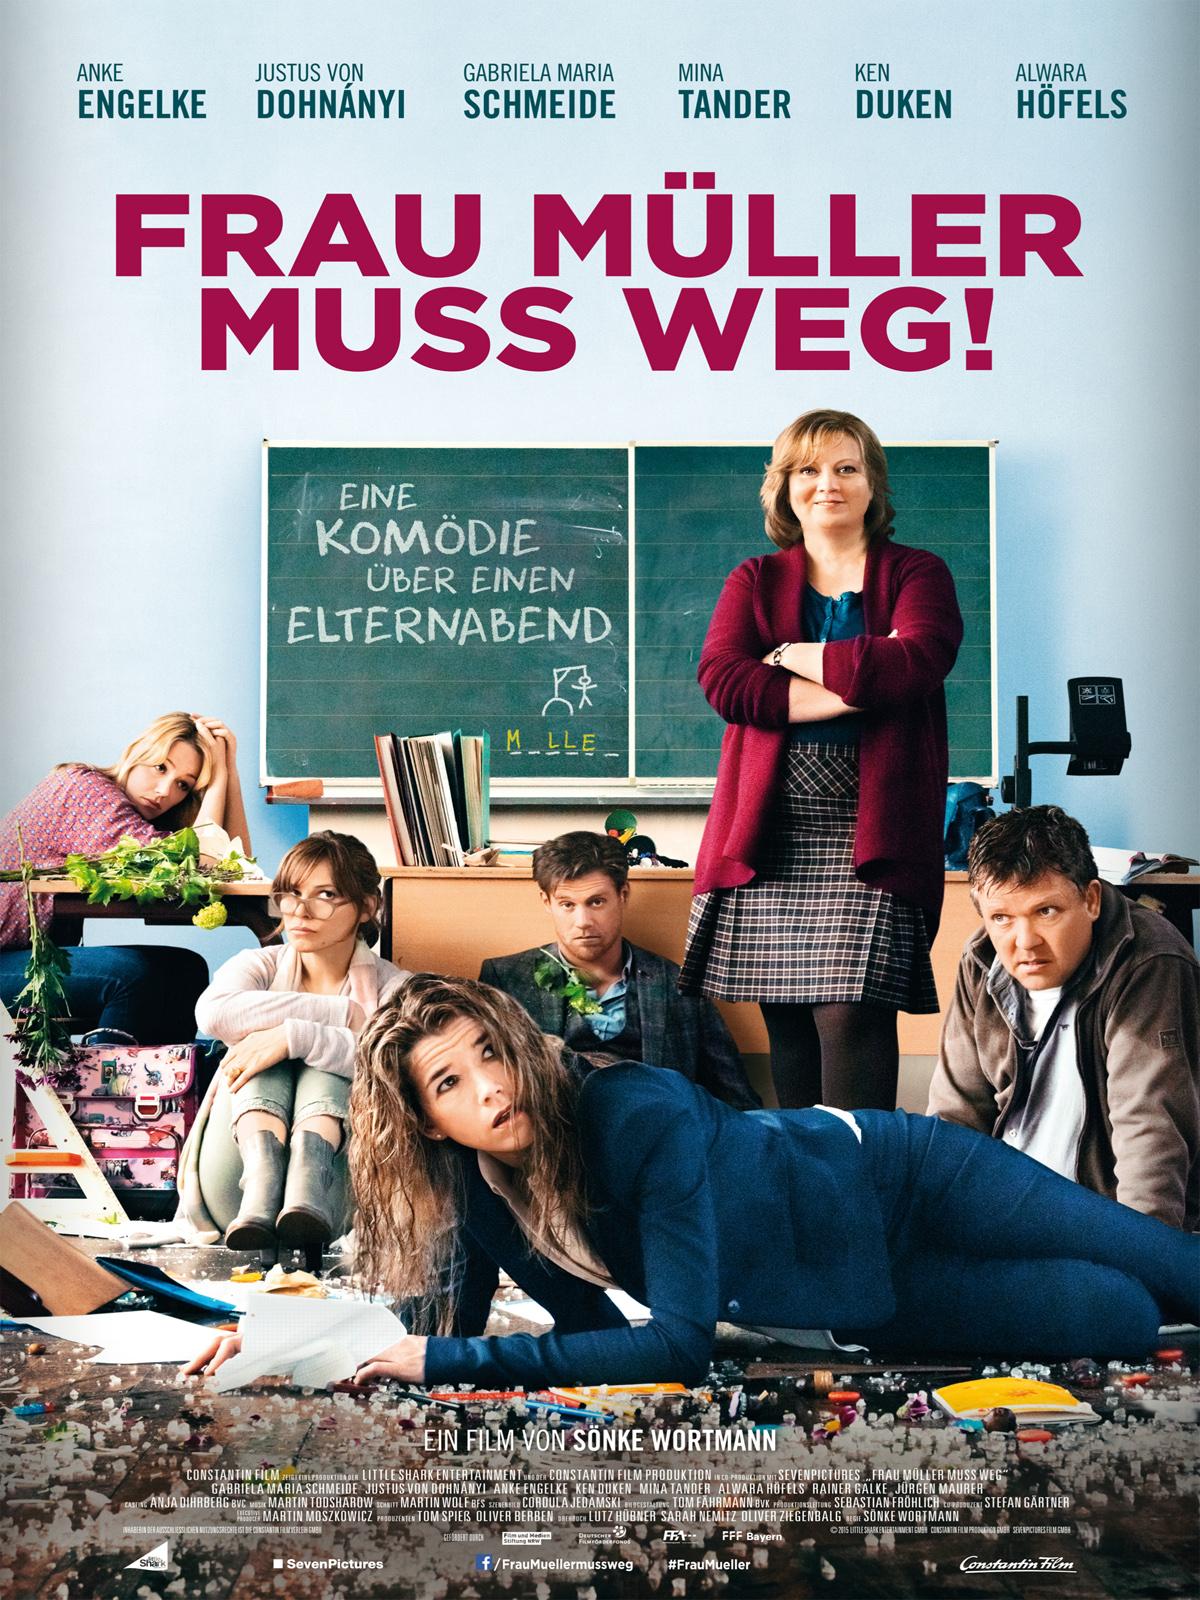 Frau Meier Muss Weg